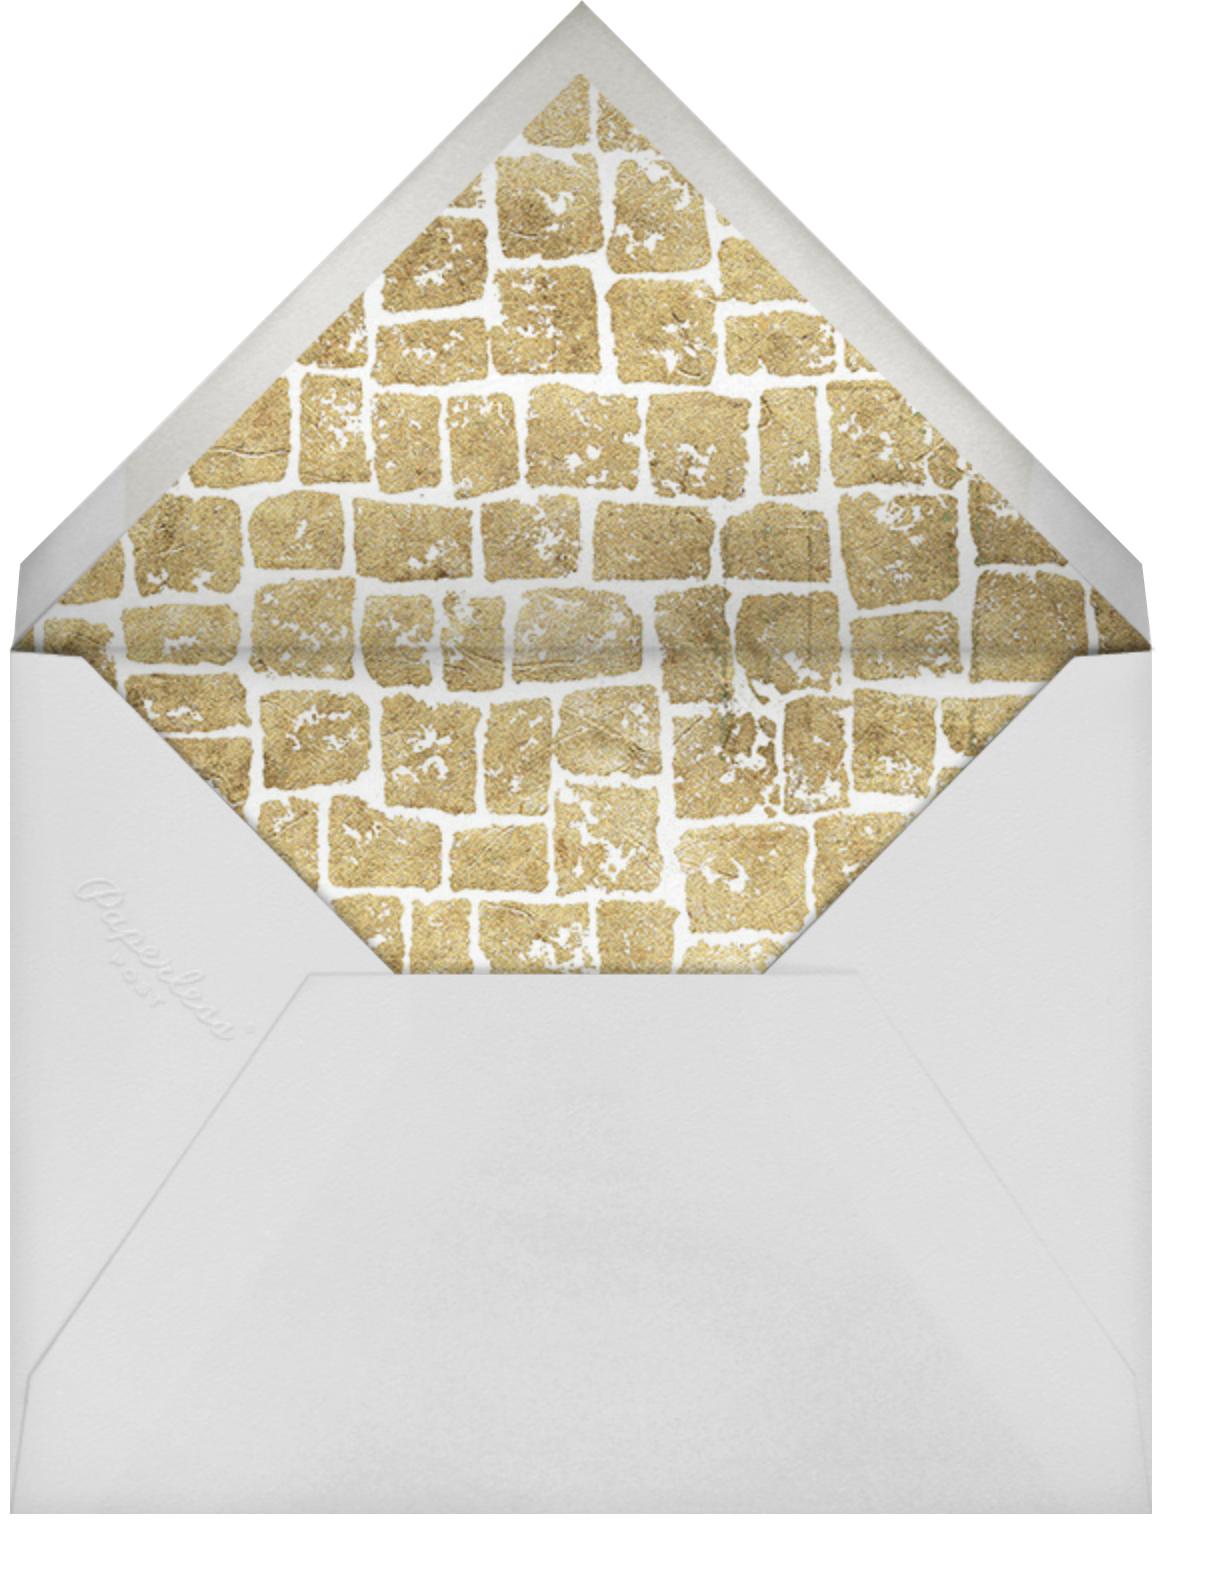 Gilded - Kelly Wearstler - Engagement party - envelope back